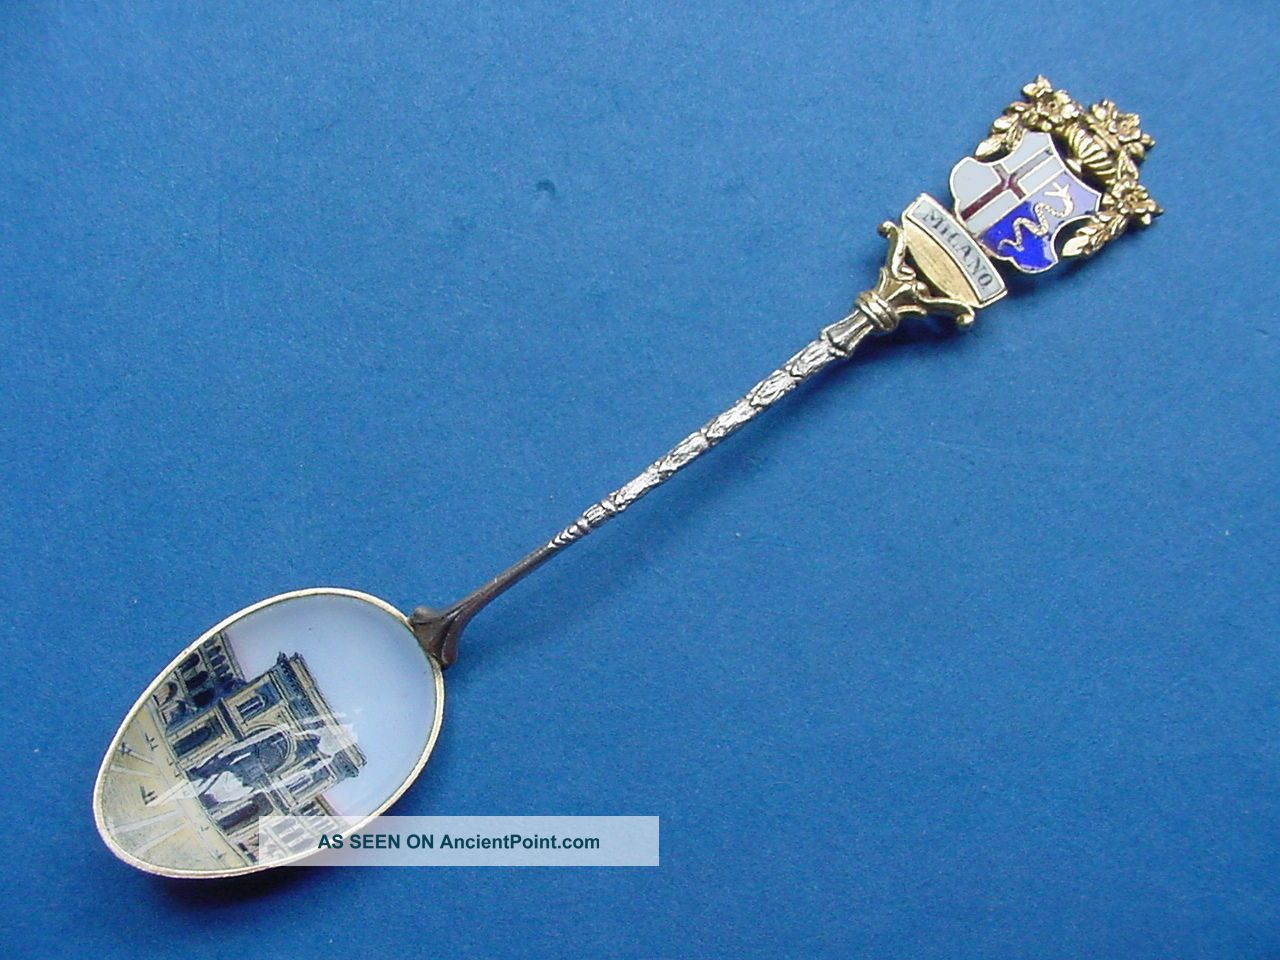 Antique Continental Silver Souvenir Spoon - Enameled